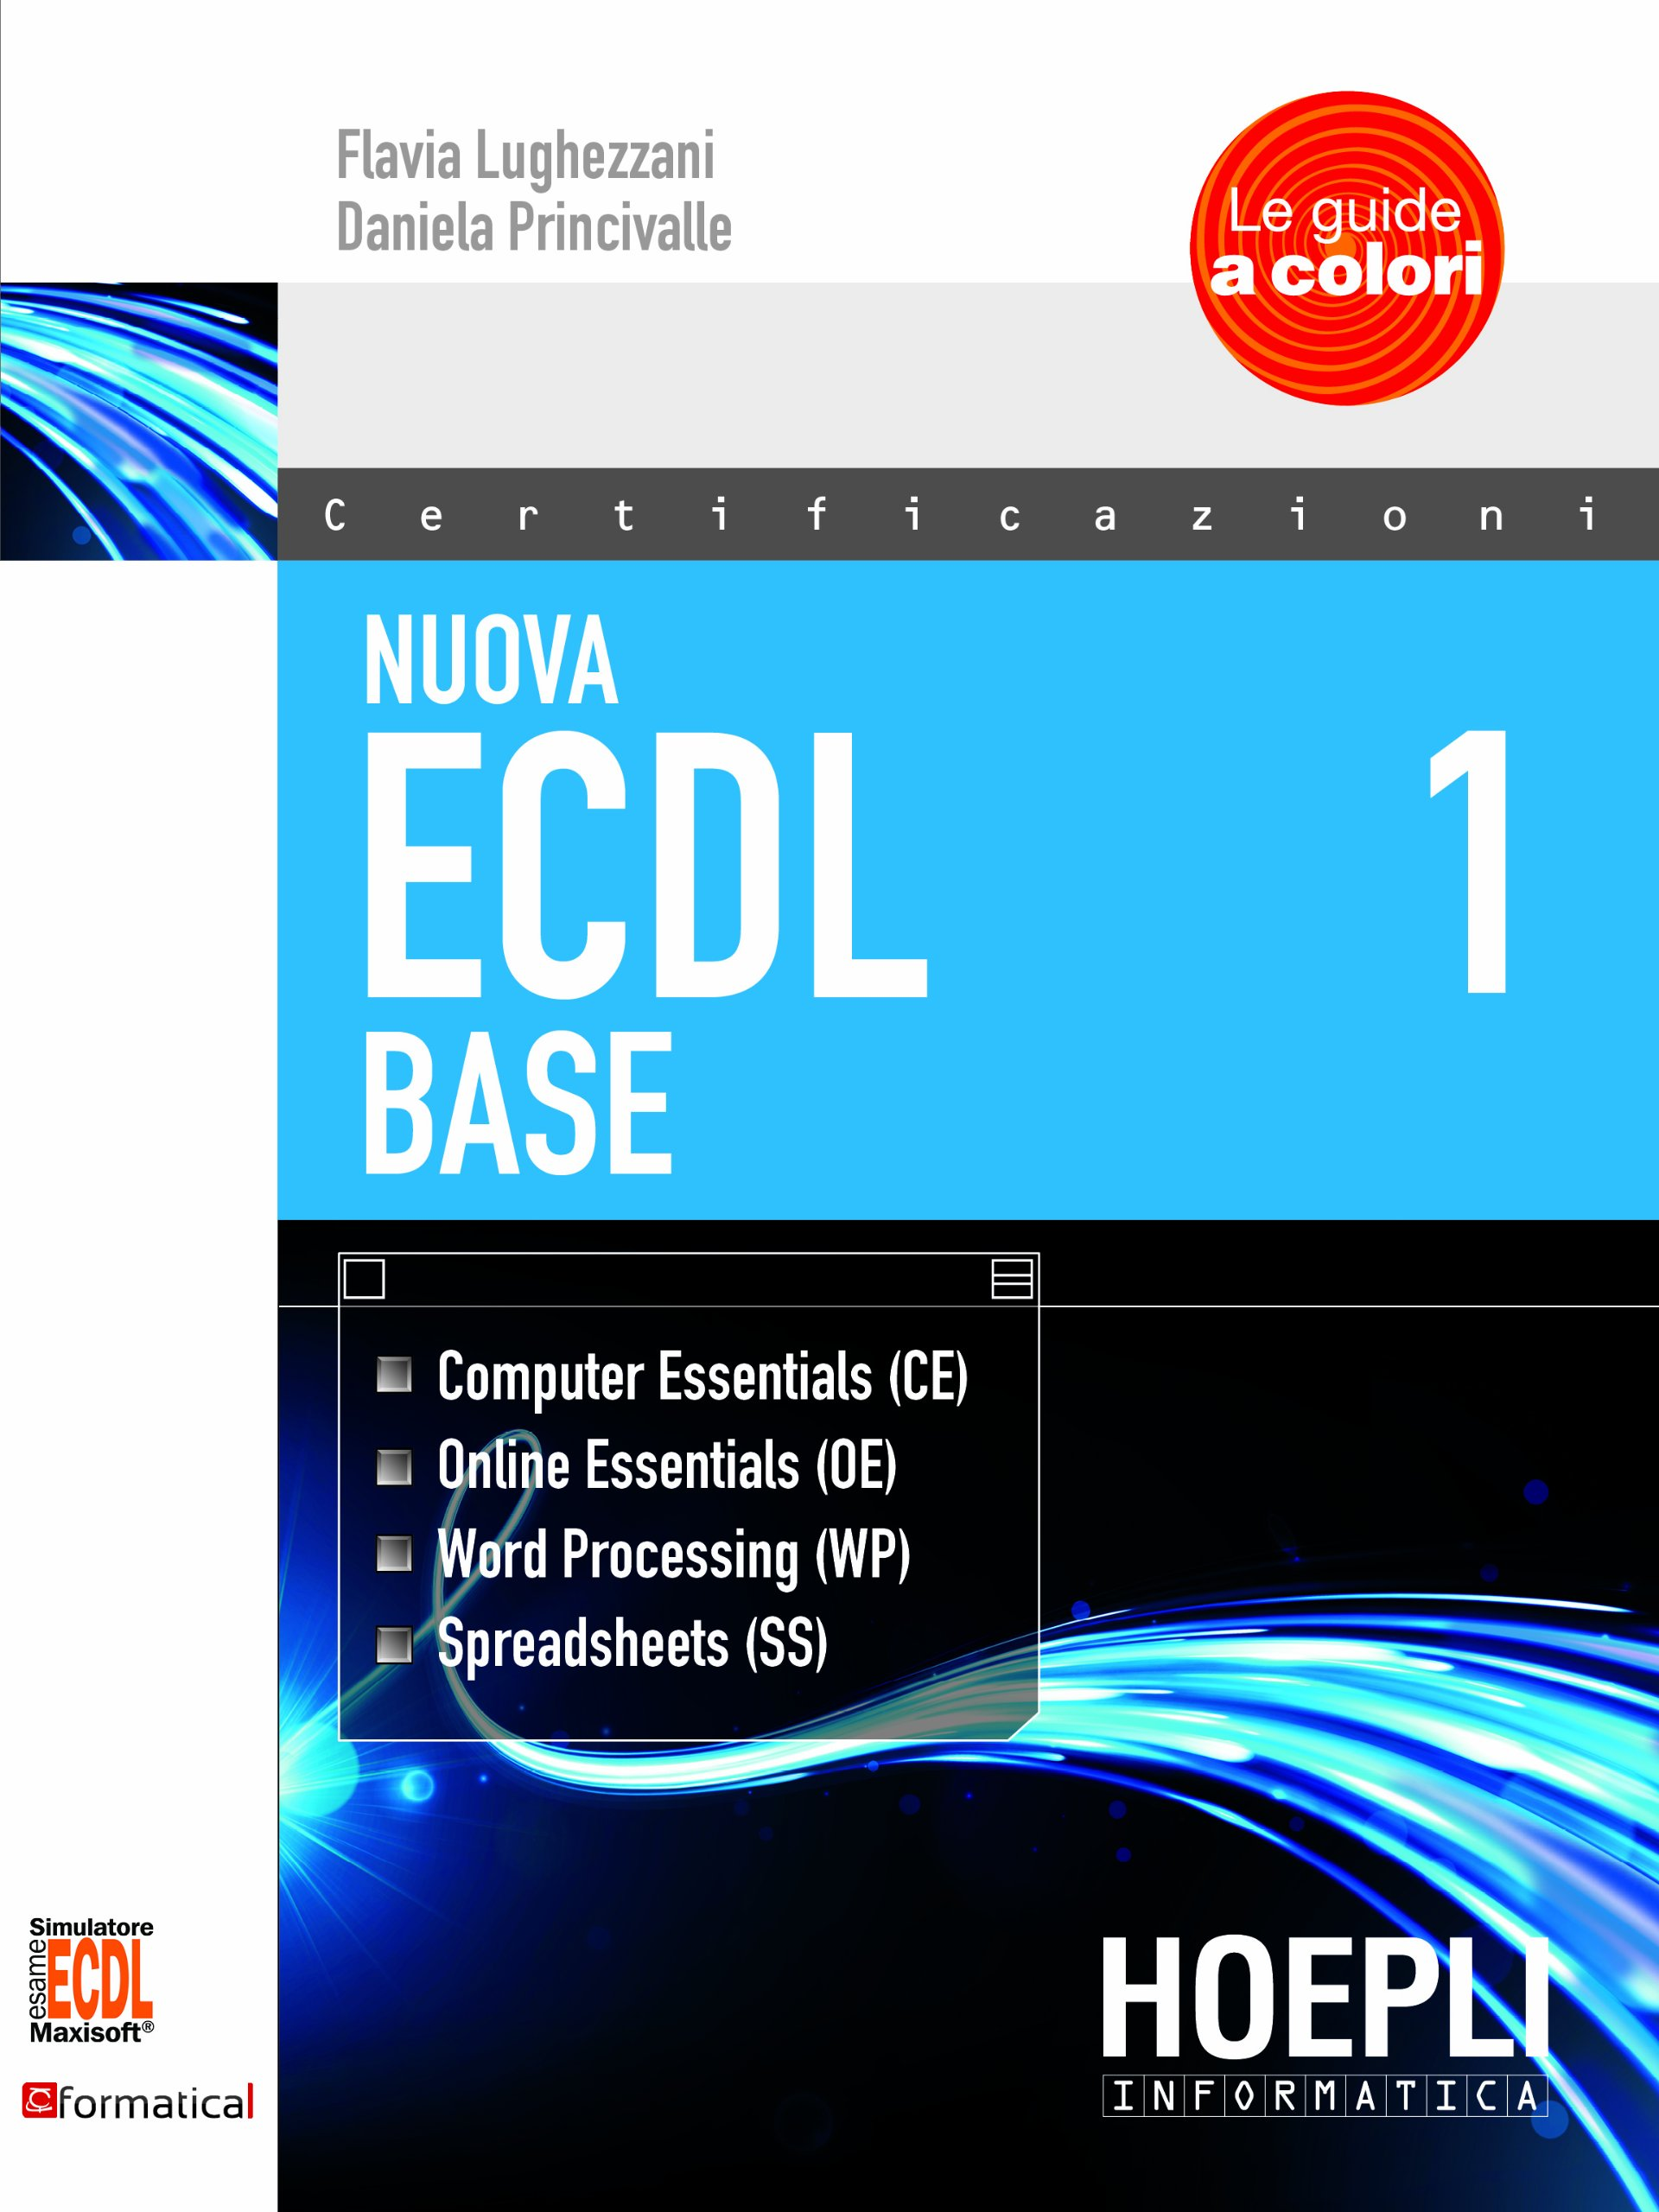 Nuova ECDL 1-2: ECDL Base-ECDL Full Standard Extension Copertina flessibile – 12 giu 2014 Flavia Lughezzani Daniela Princivalle Hoepli 8820362813